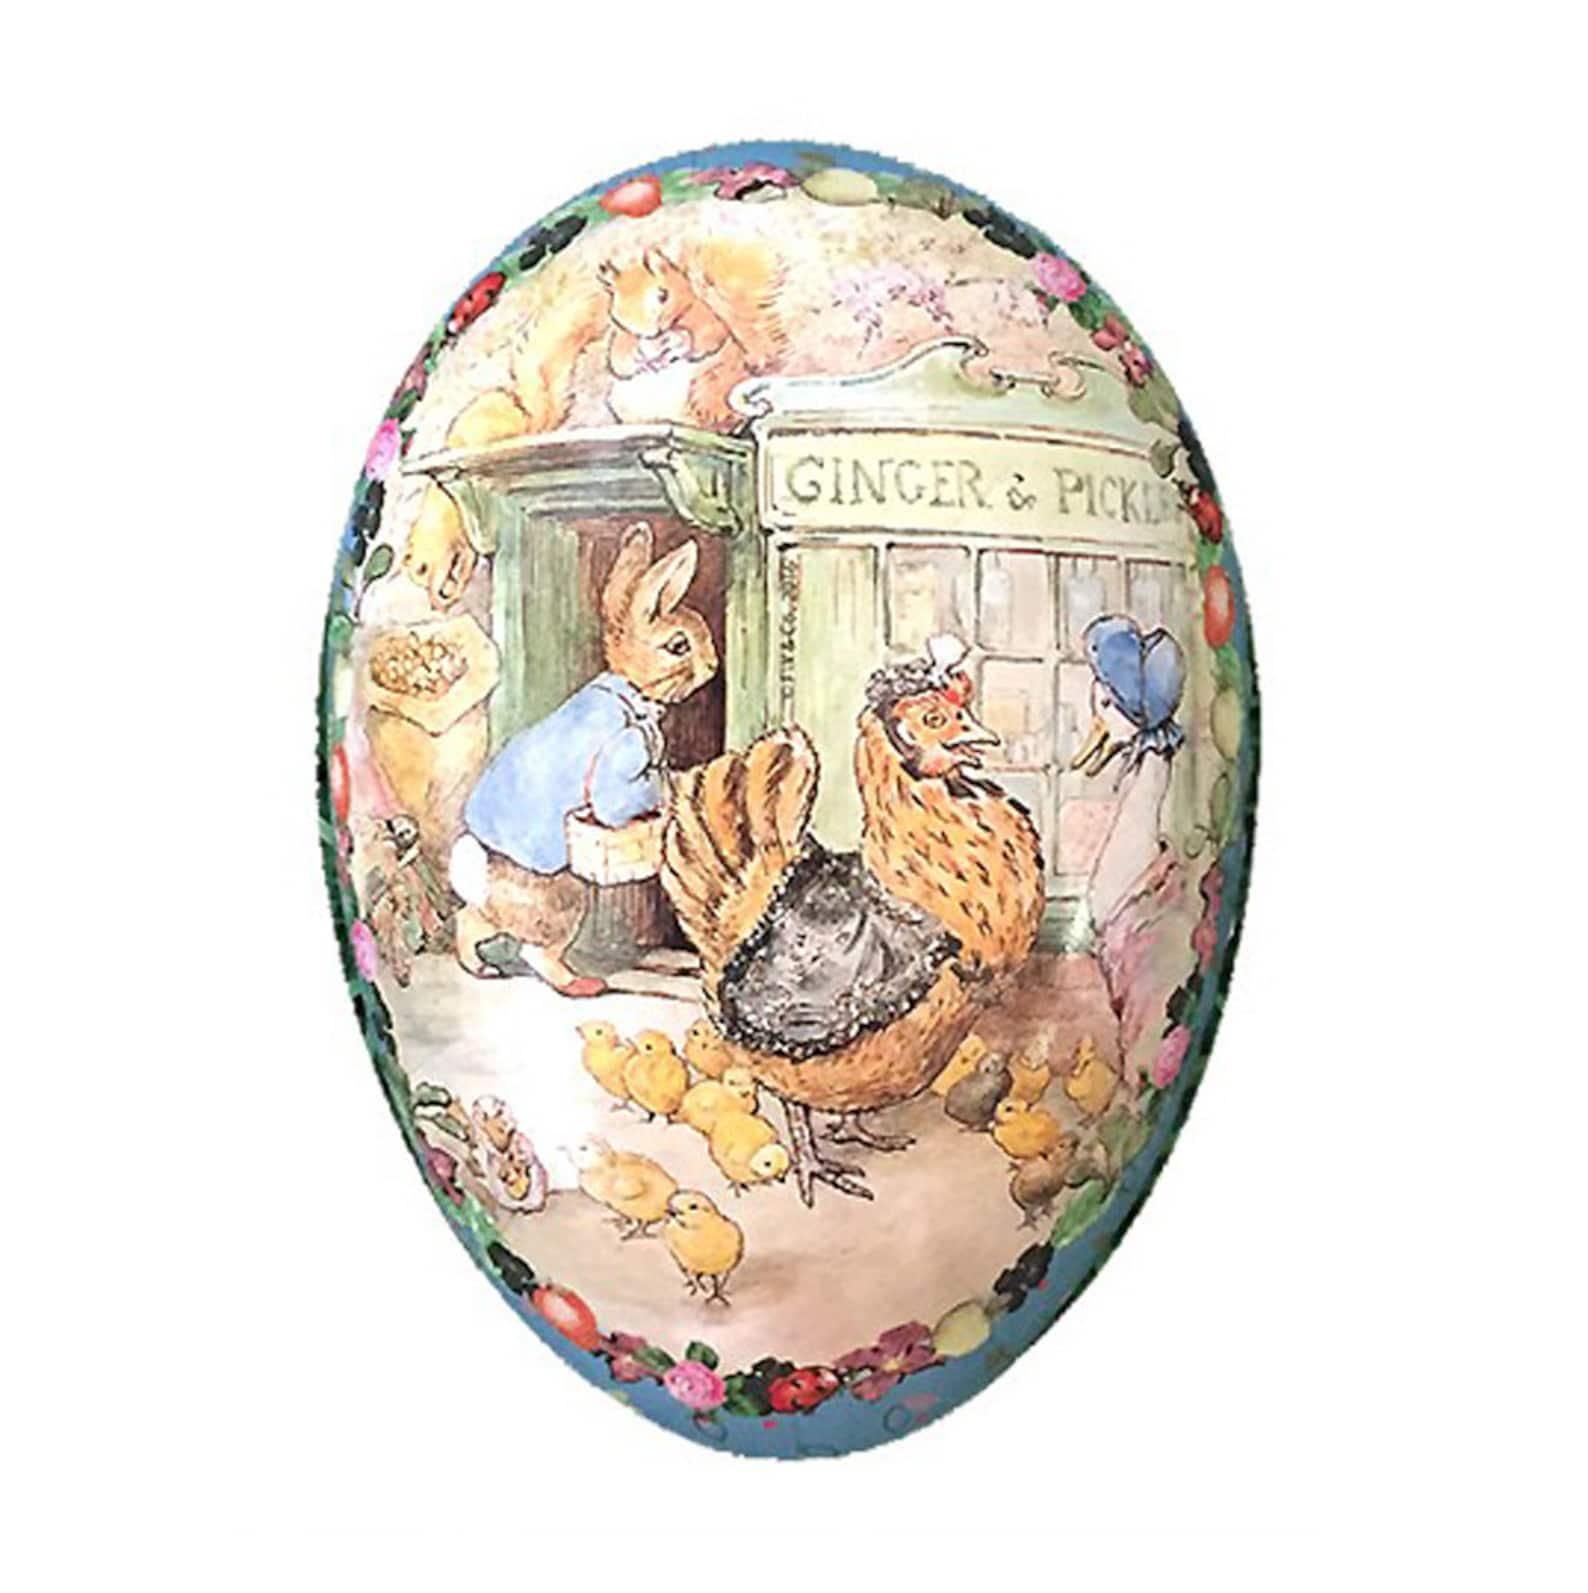 Peter Rabbit Germany Paper Mache Easter Egg Box Ginger & Pickles Beatrix Potter 4-1/2